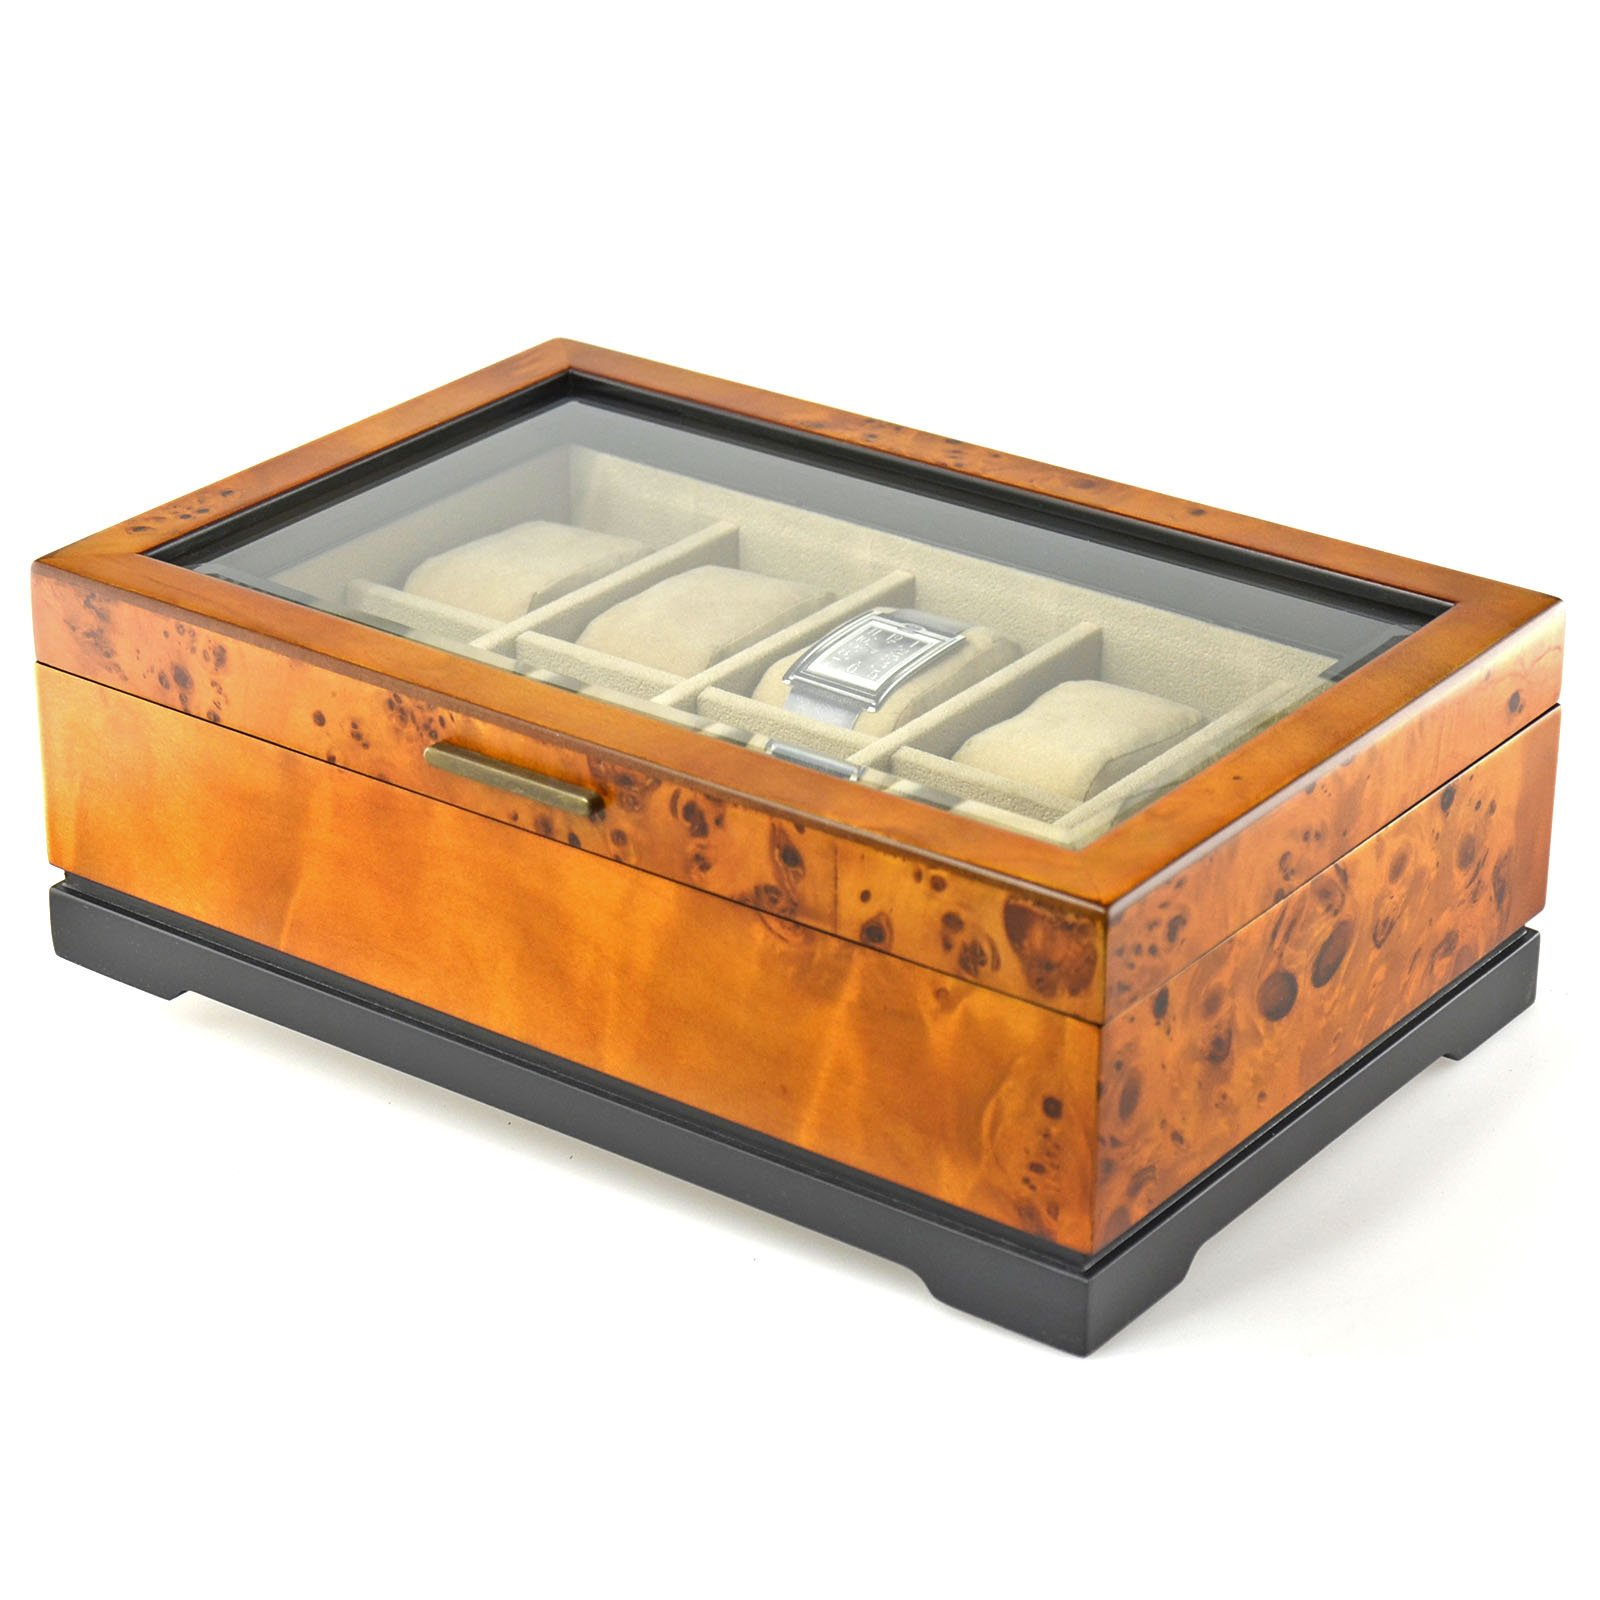 Marlborough Wood Valet And Display Watch Case Dimensions 4''H x 12.75''W x 9''W